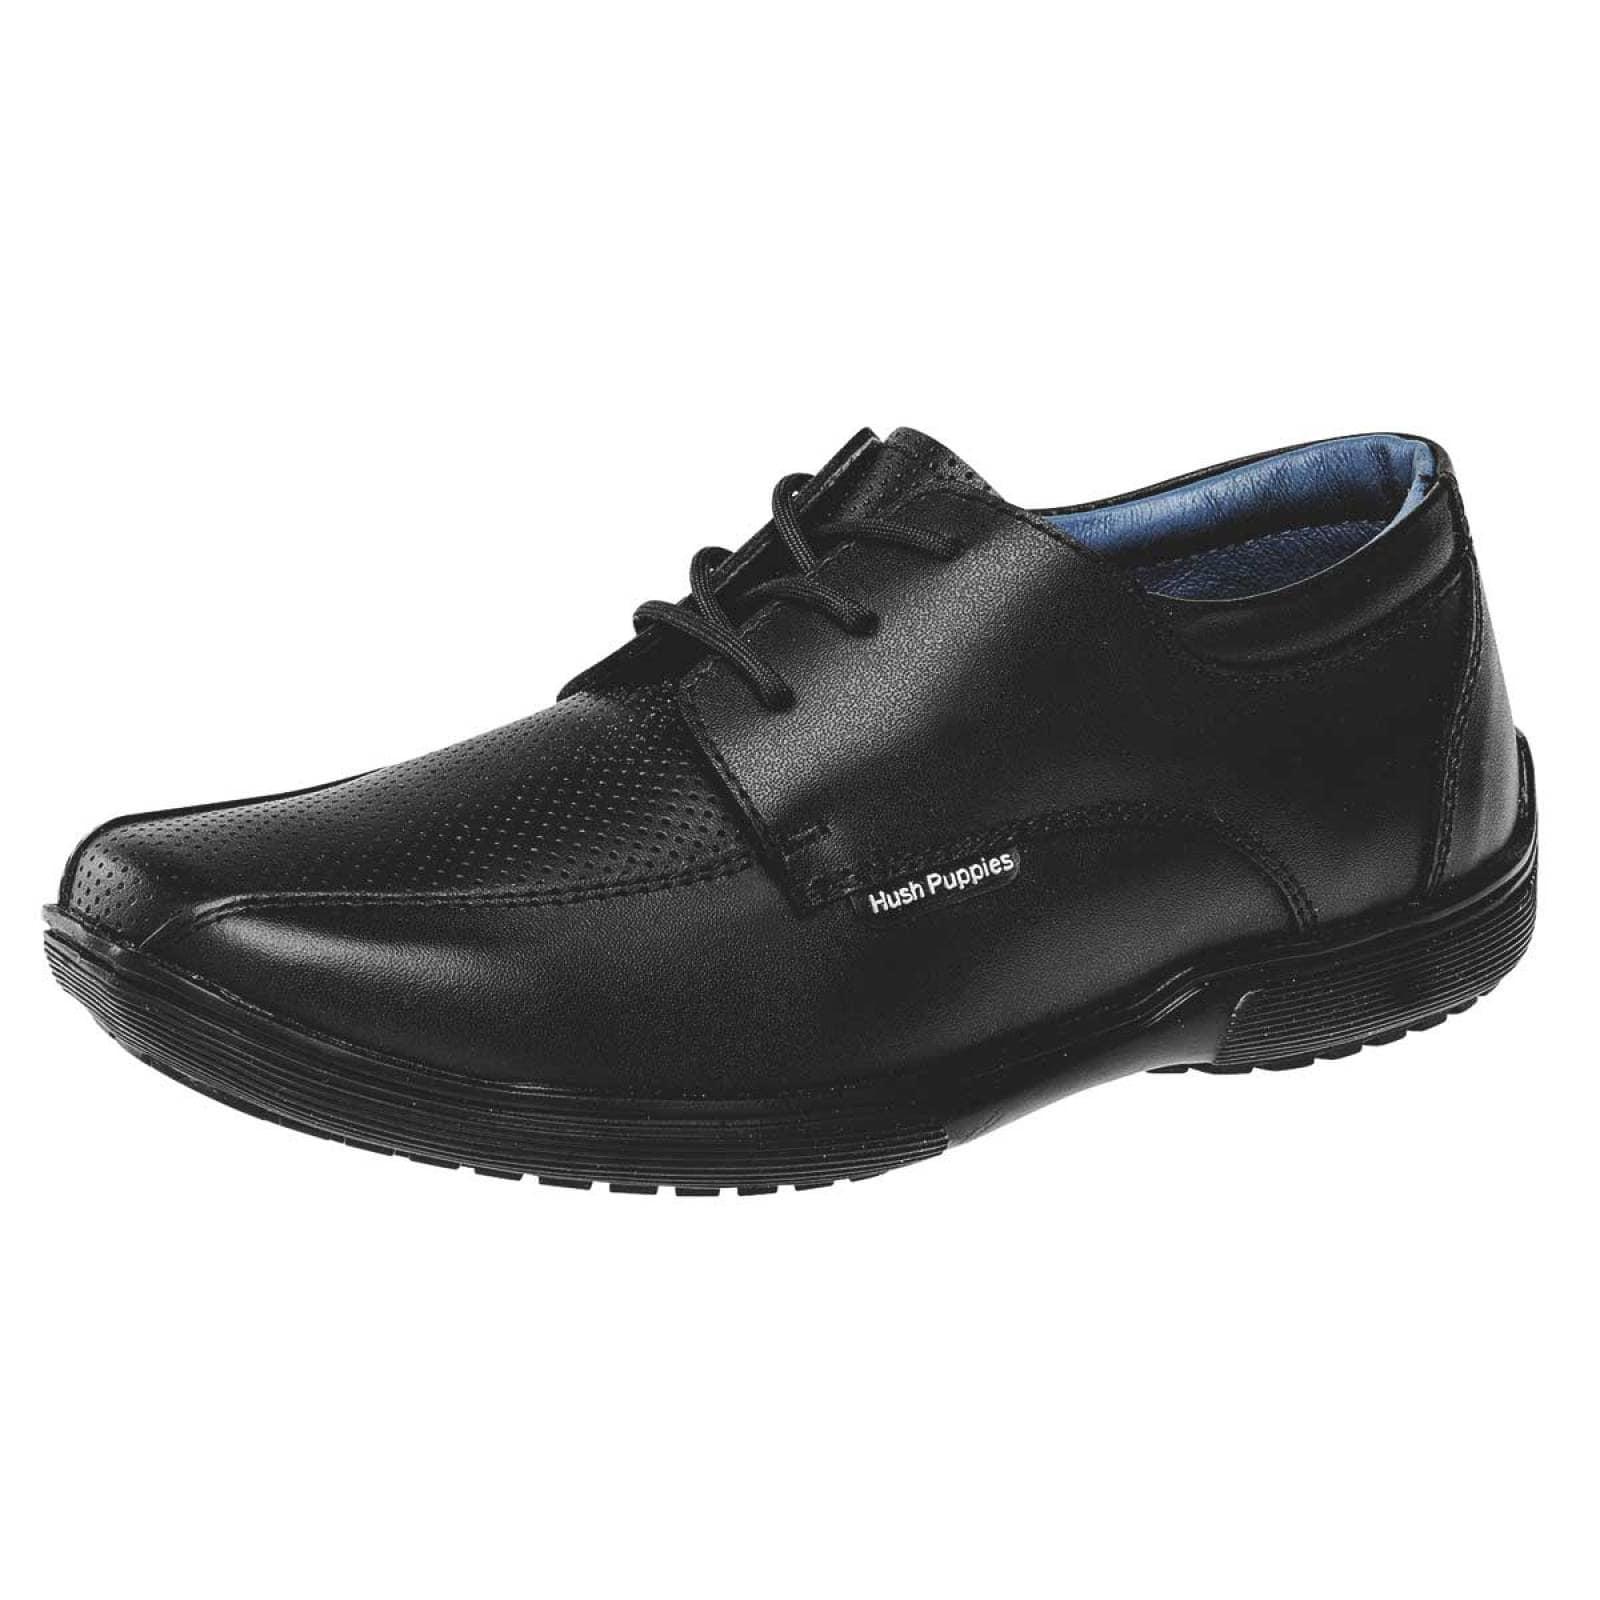 Hush puppies kids Zapato Joven Negro